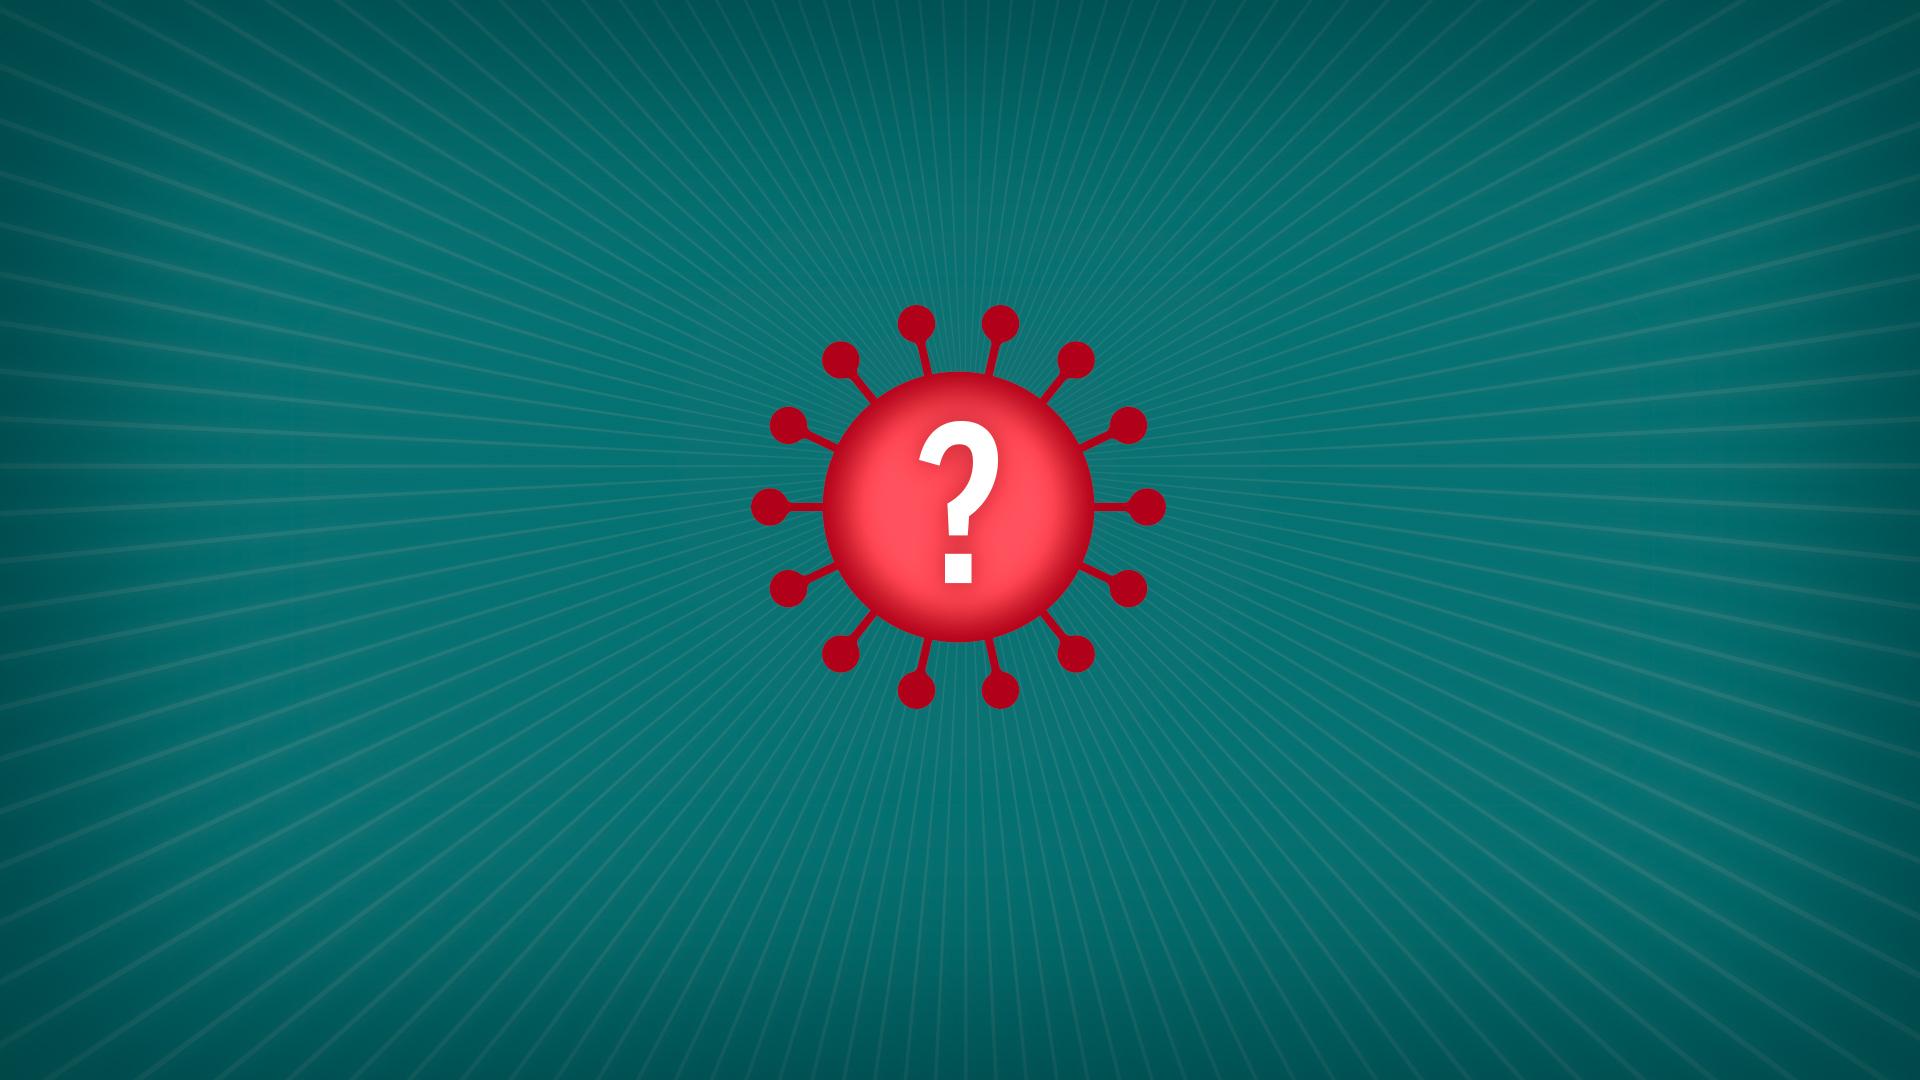 US--Virus Outbreak-Viral Questions-Delta Variant